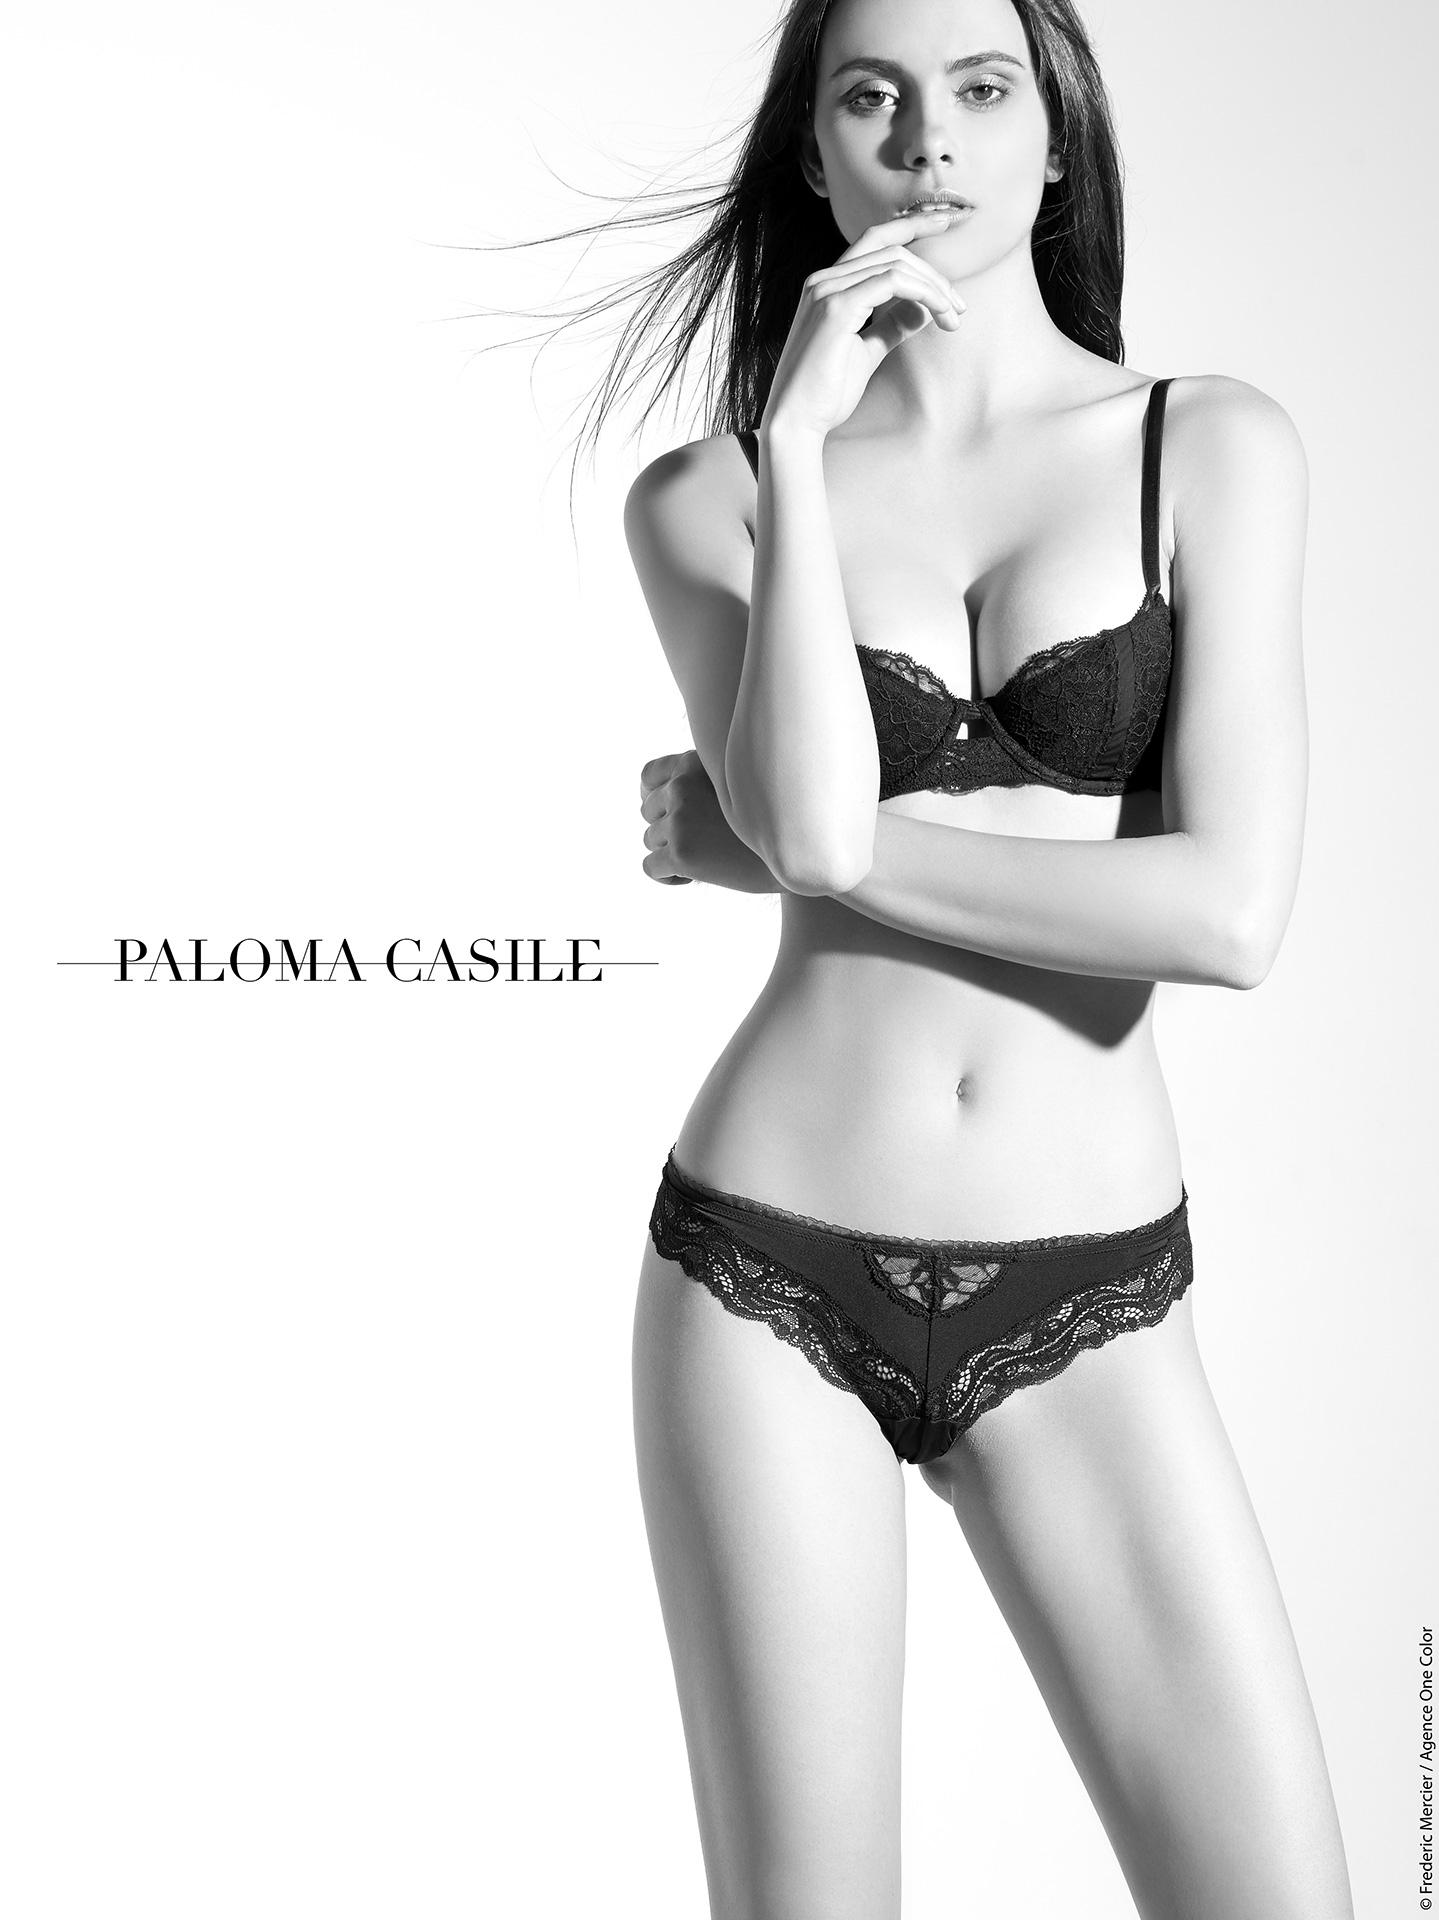 paloma casile ss 2015 campaign lingerie underwear frederic mercier fashion photographer one color